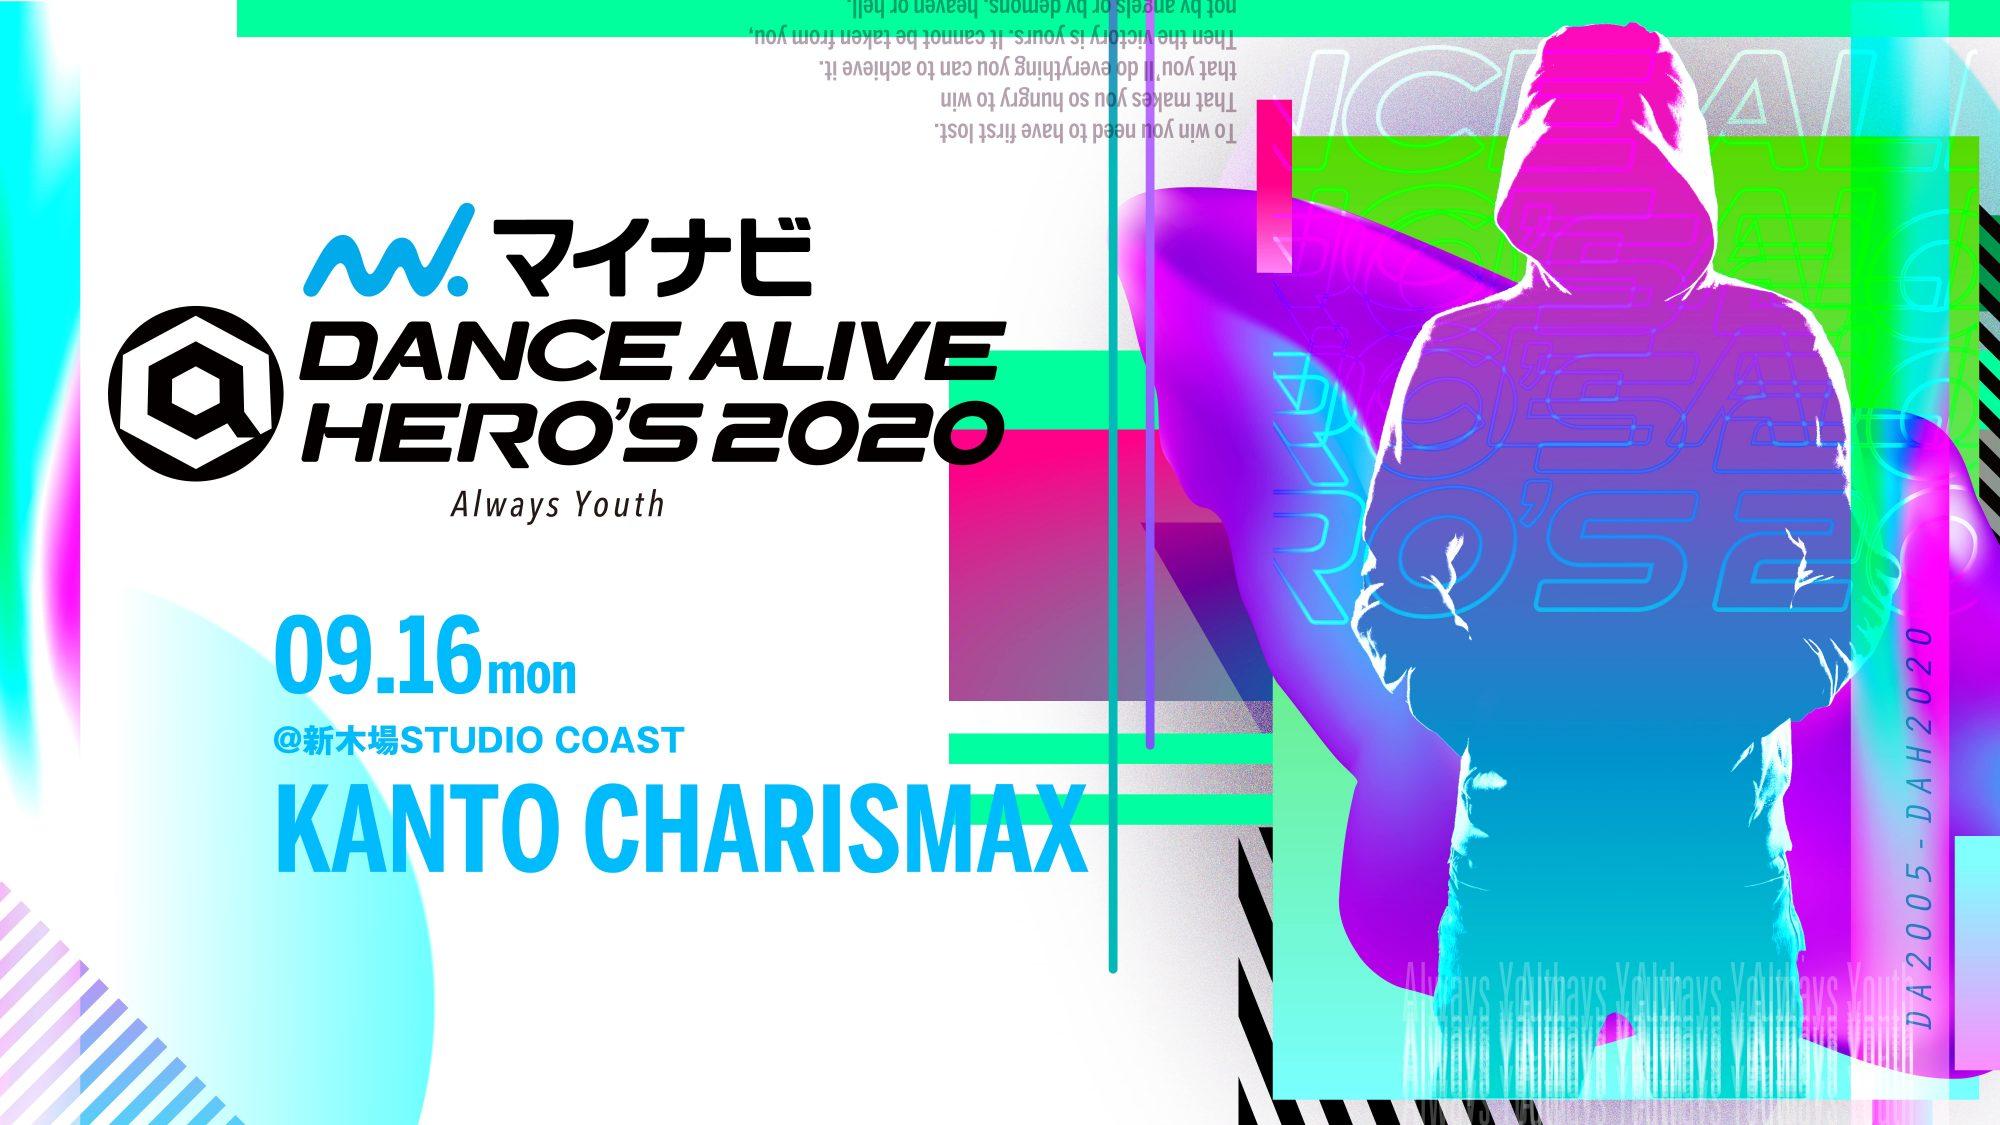 KANTO CHARISMAX&KIDS KANTO vol.2のエントリーが開始されました。